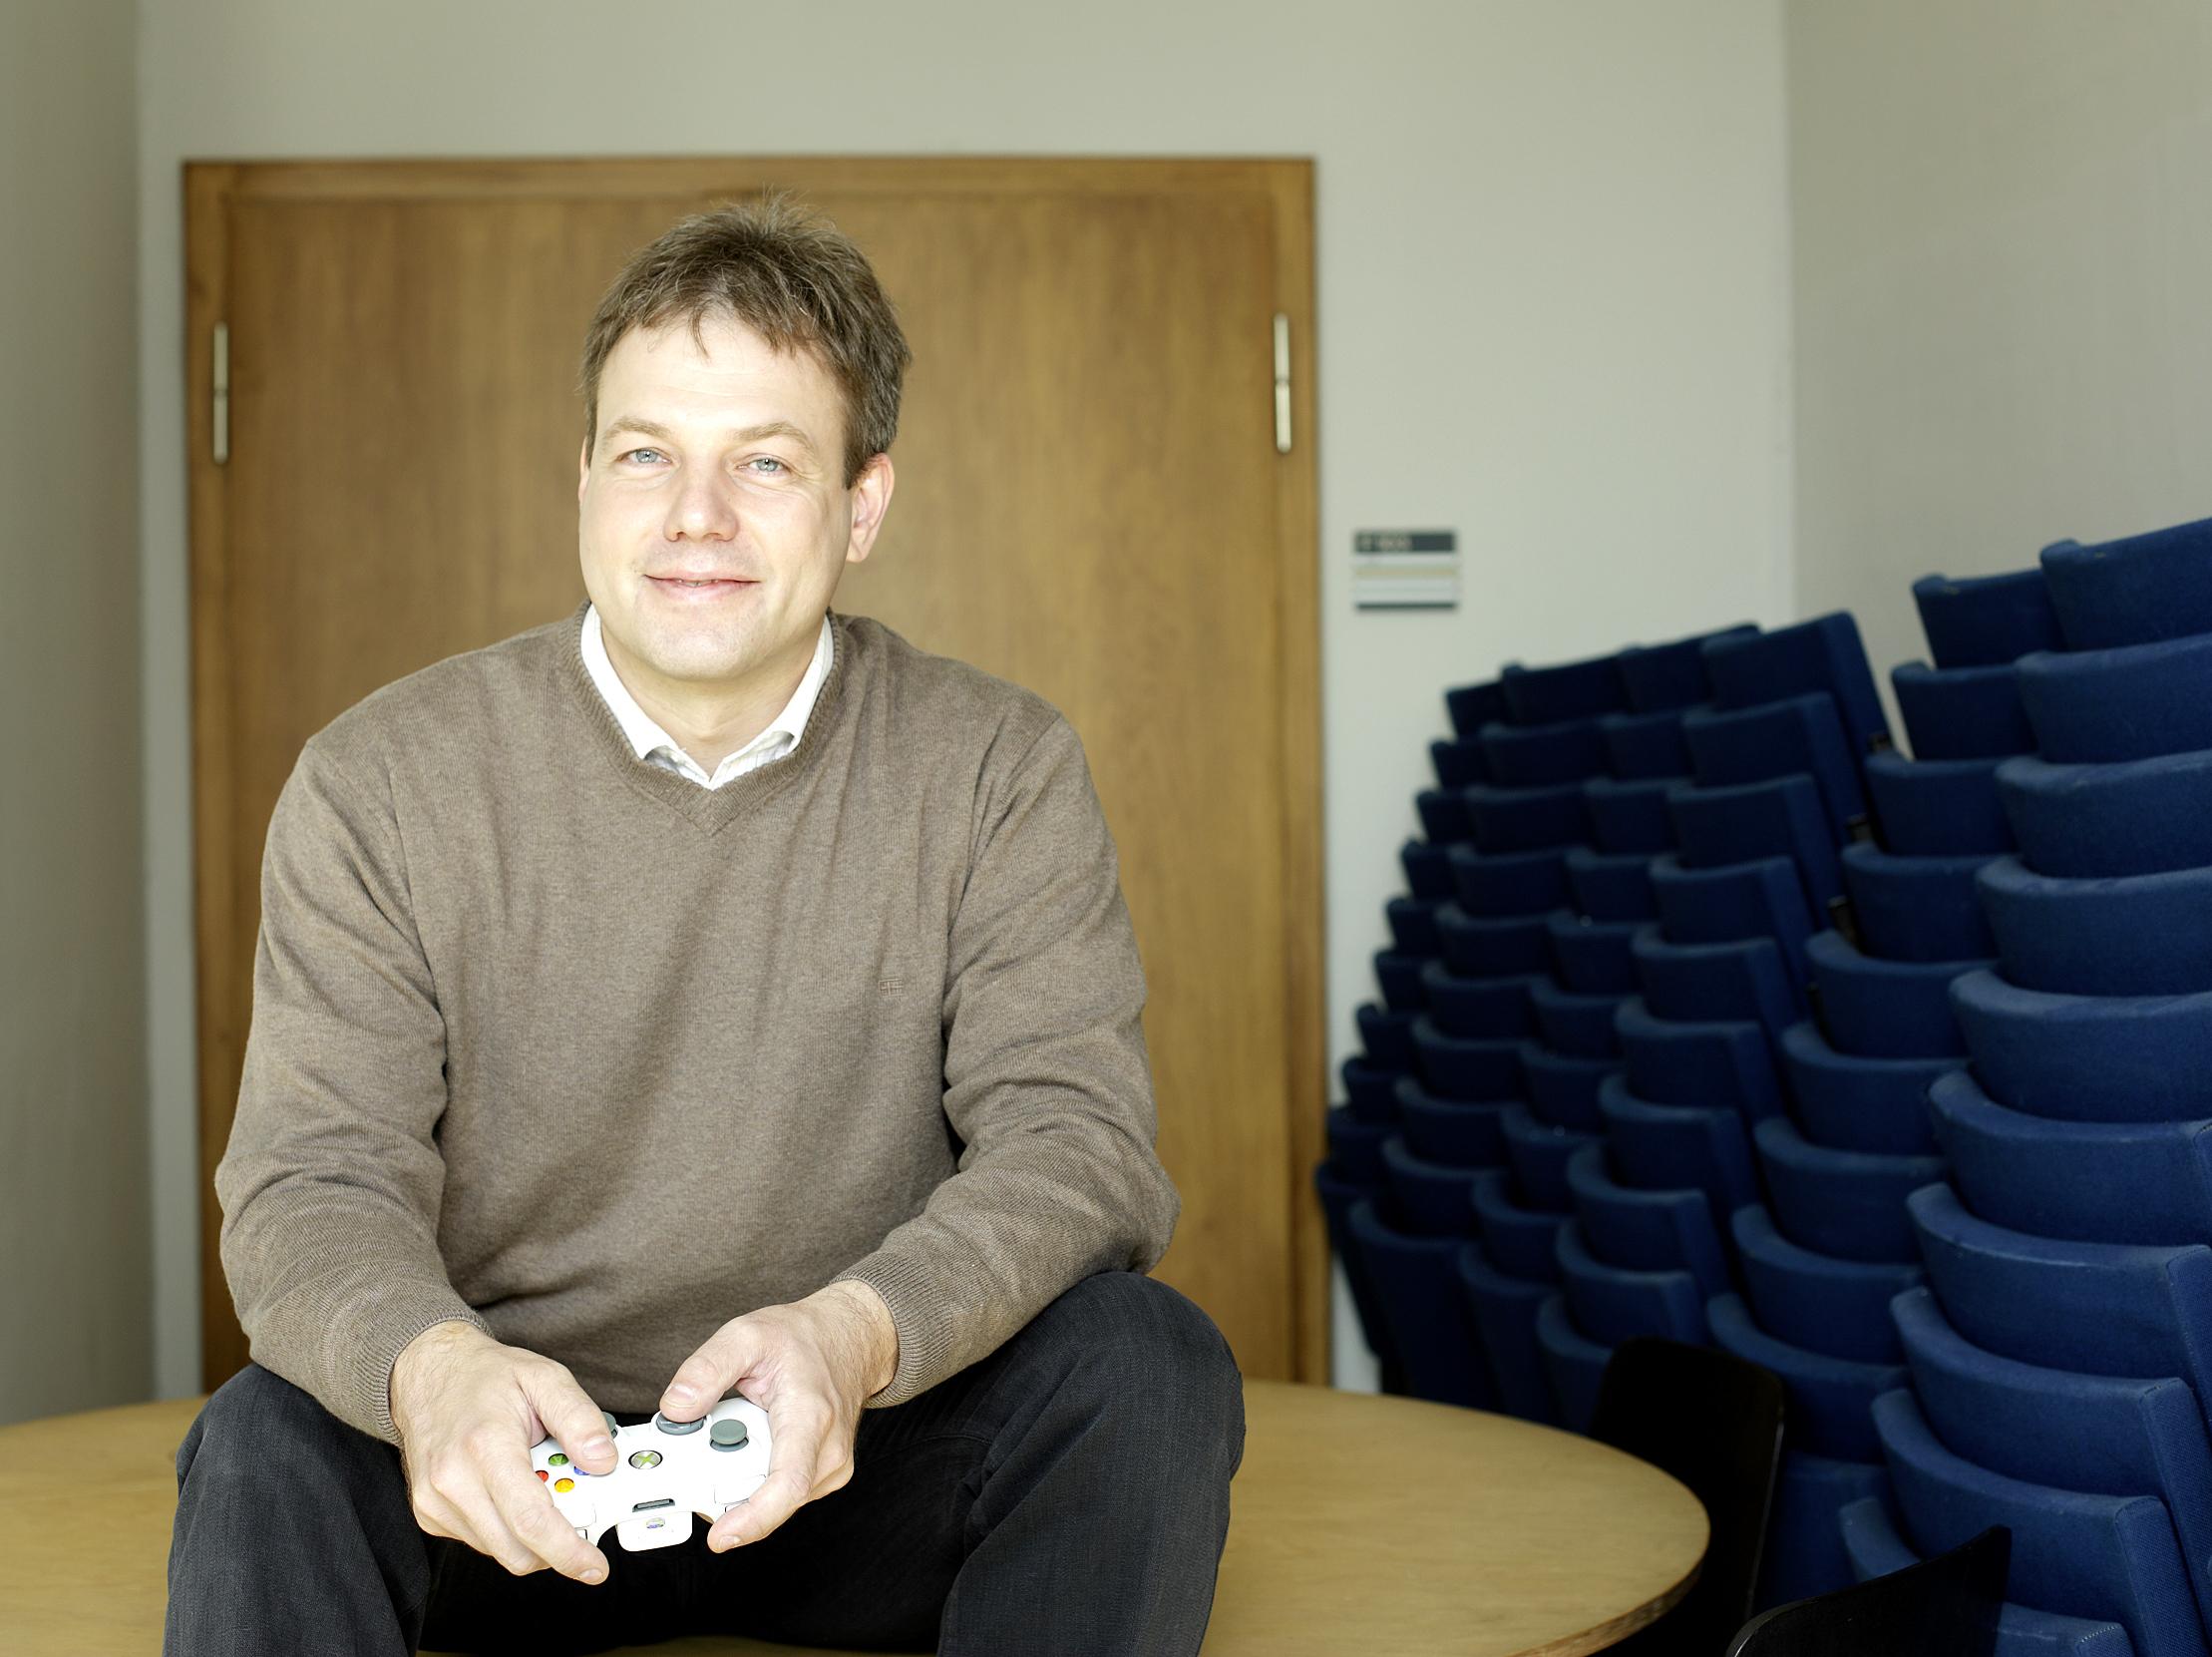 Prof. Dr. Maic Masuch